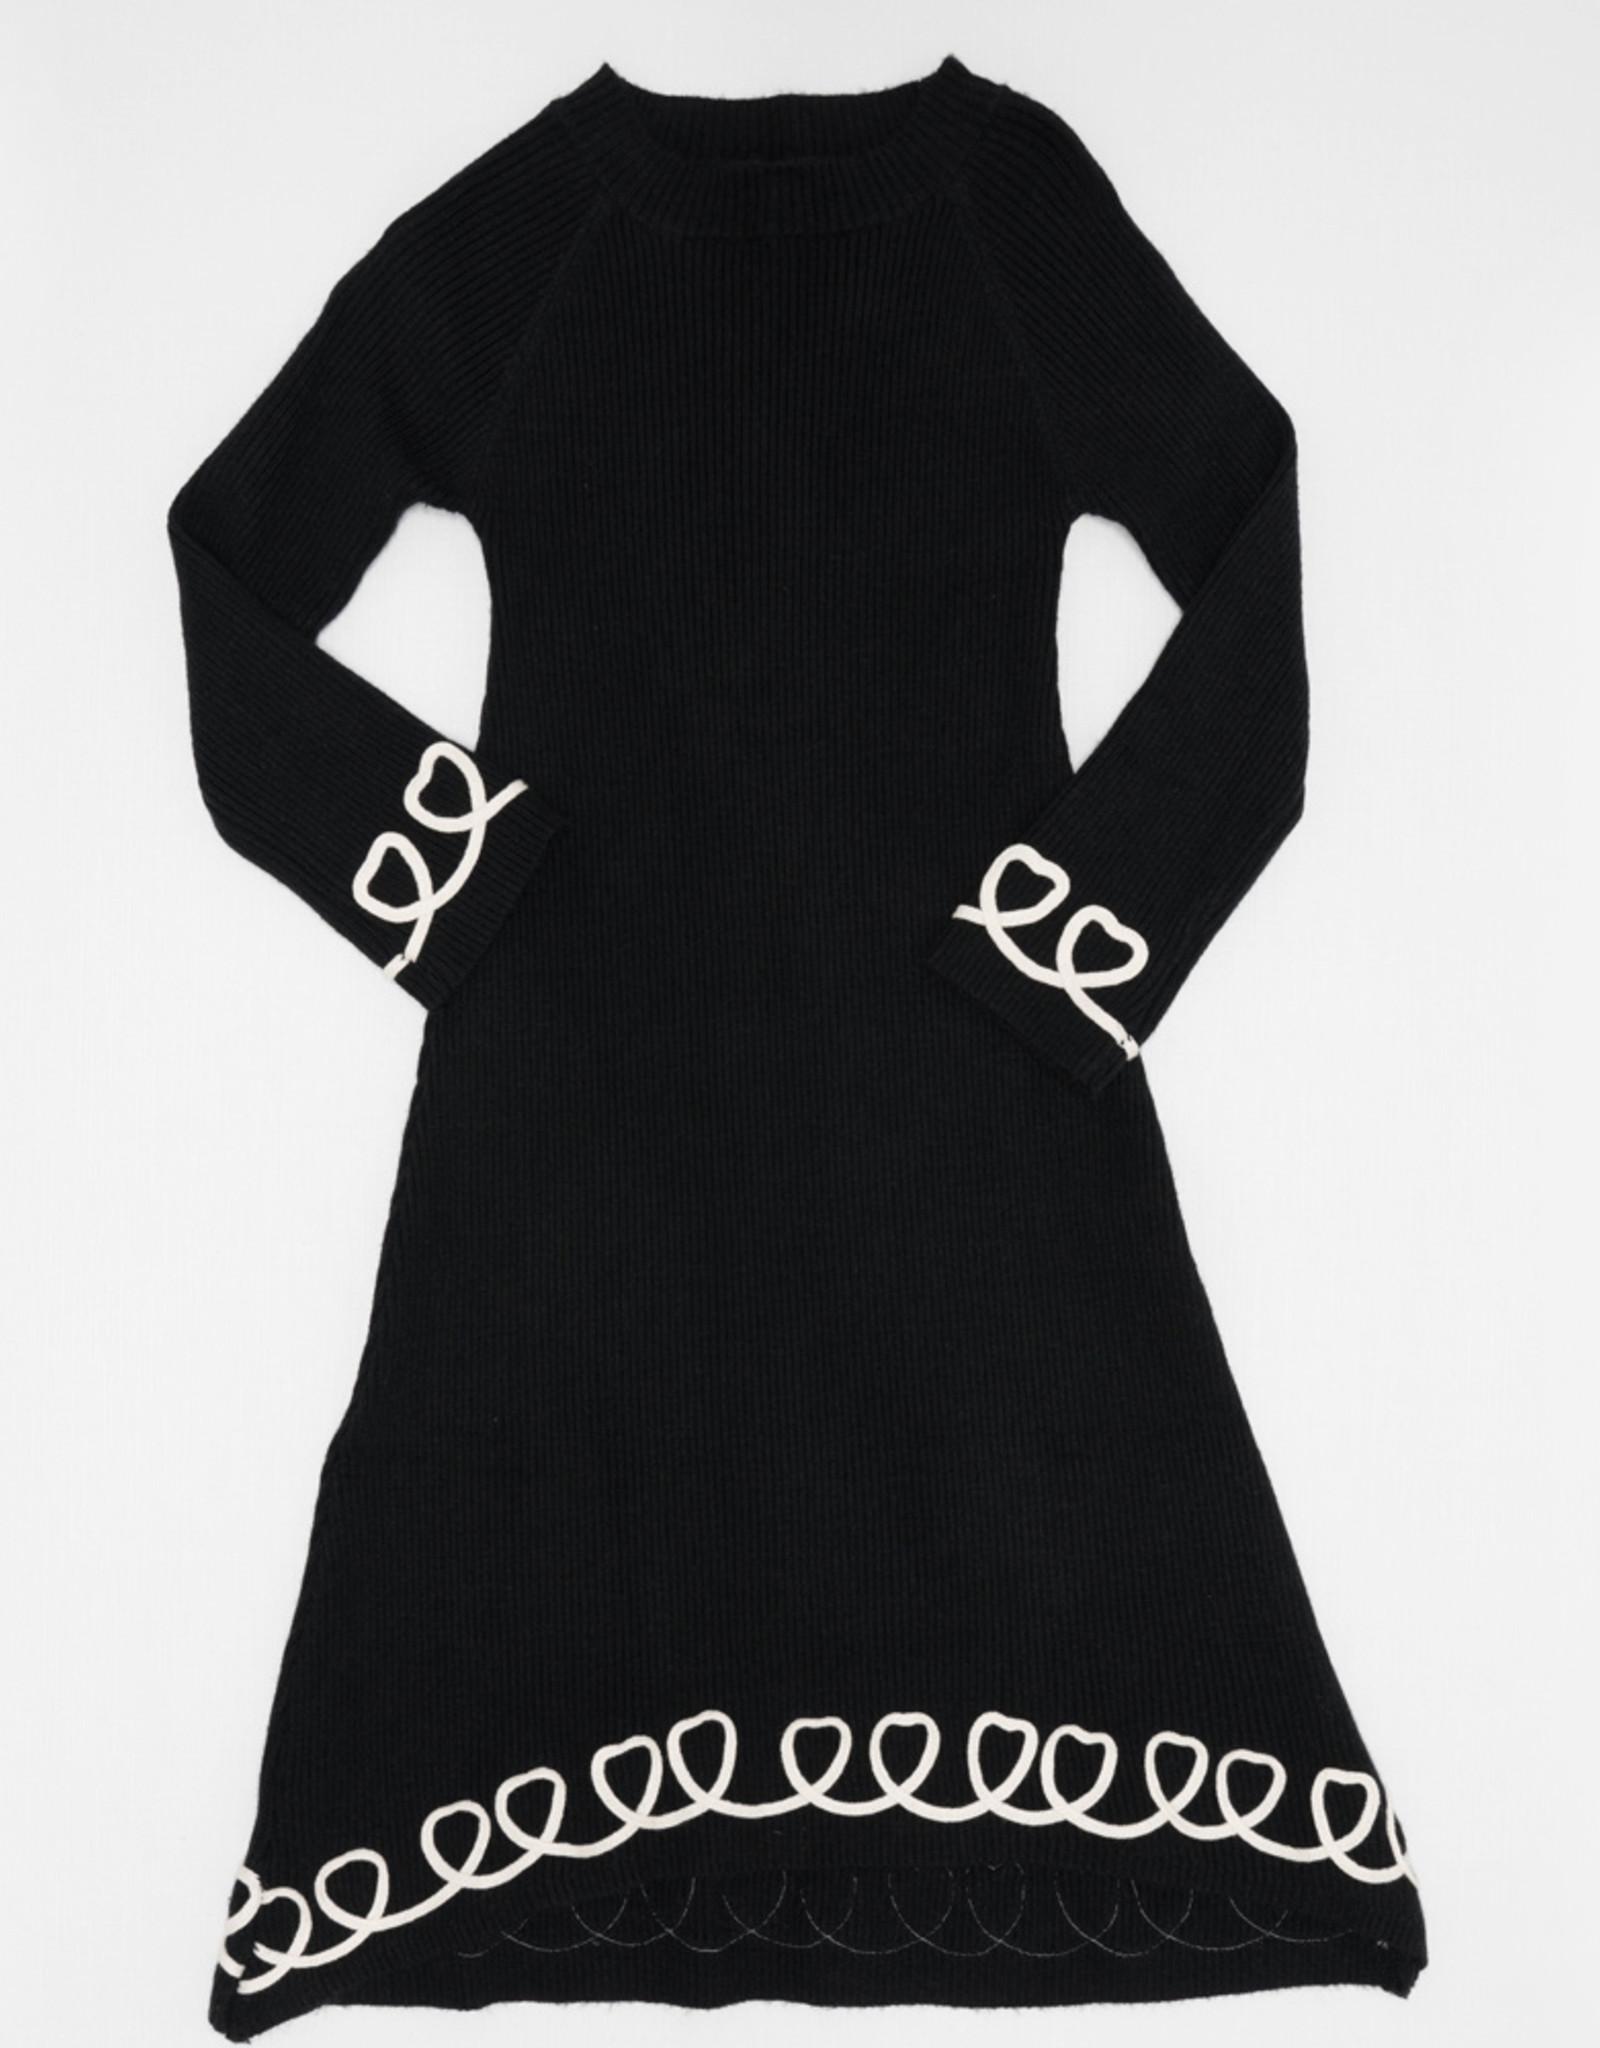 Tiffany Tiffany Rib Dress with Heart Trim